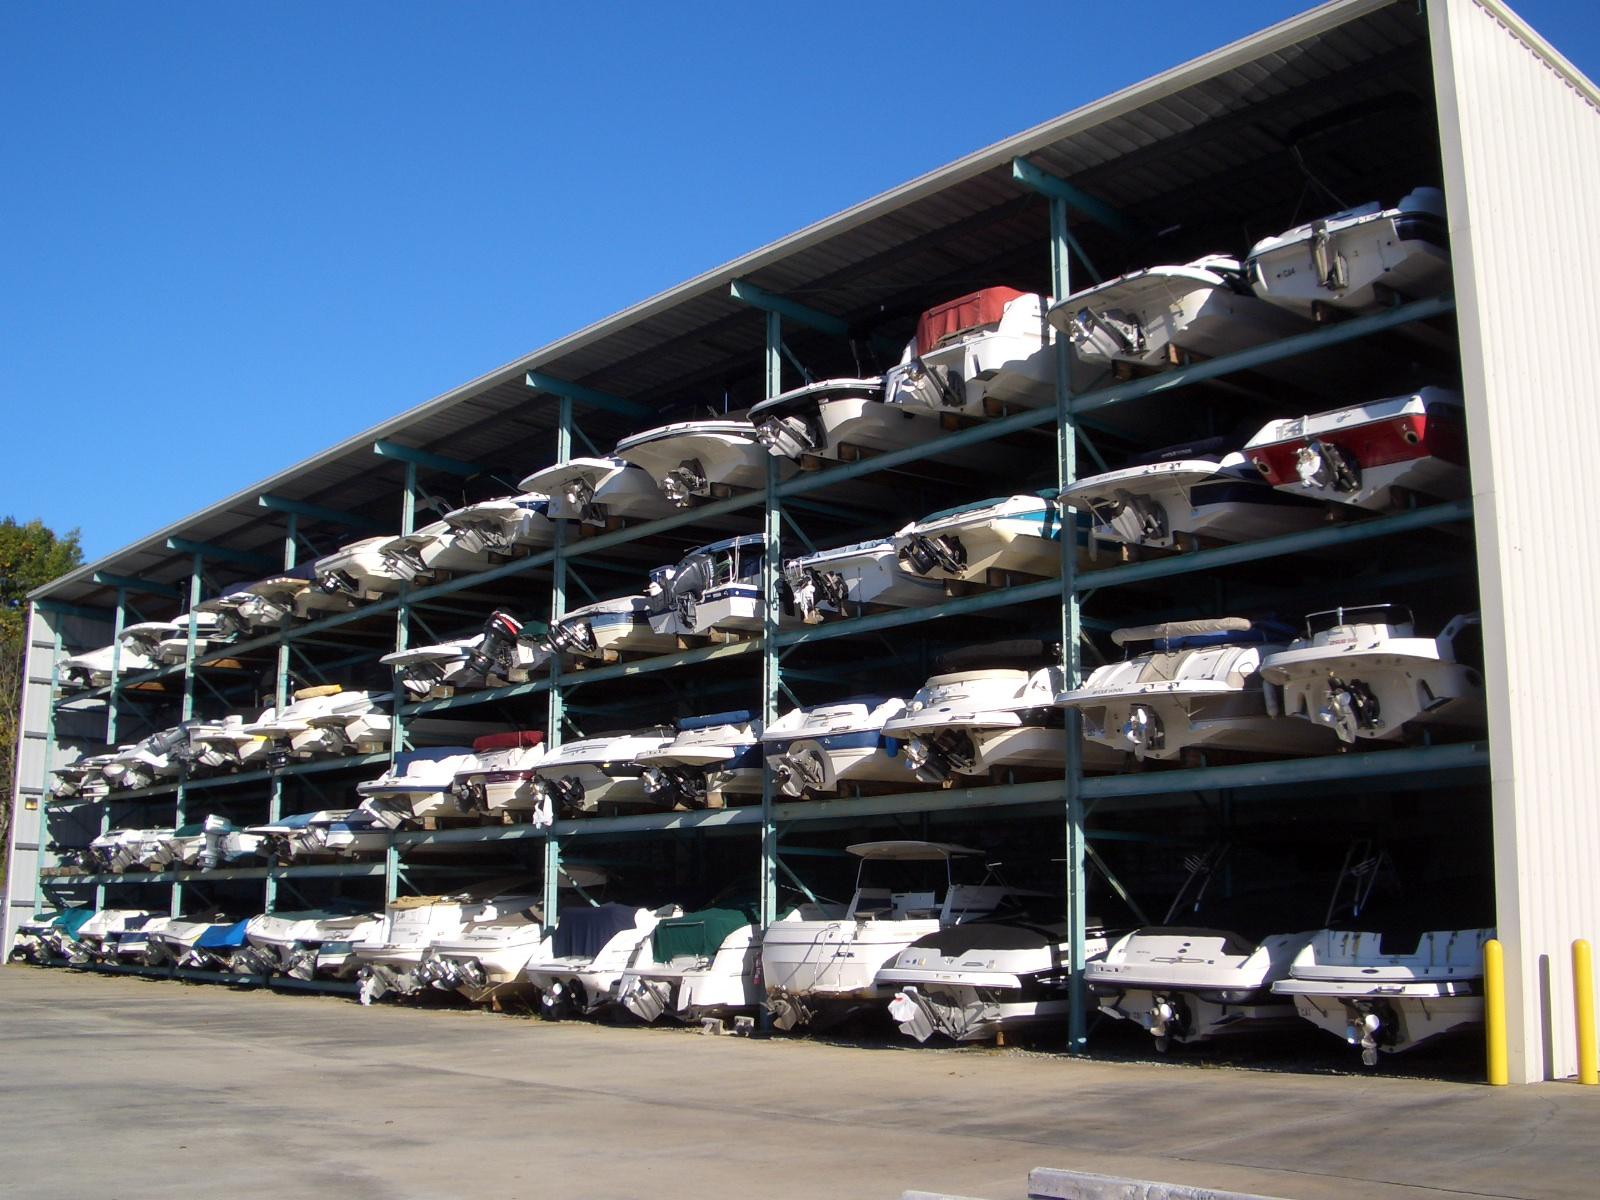 Boat Basics Options For Winter Boat Storage